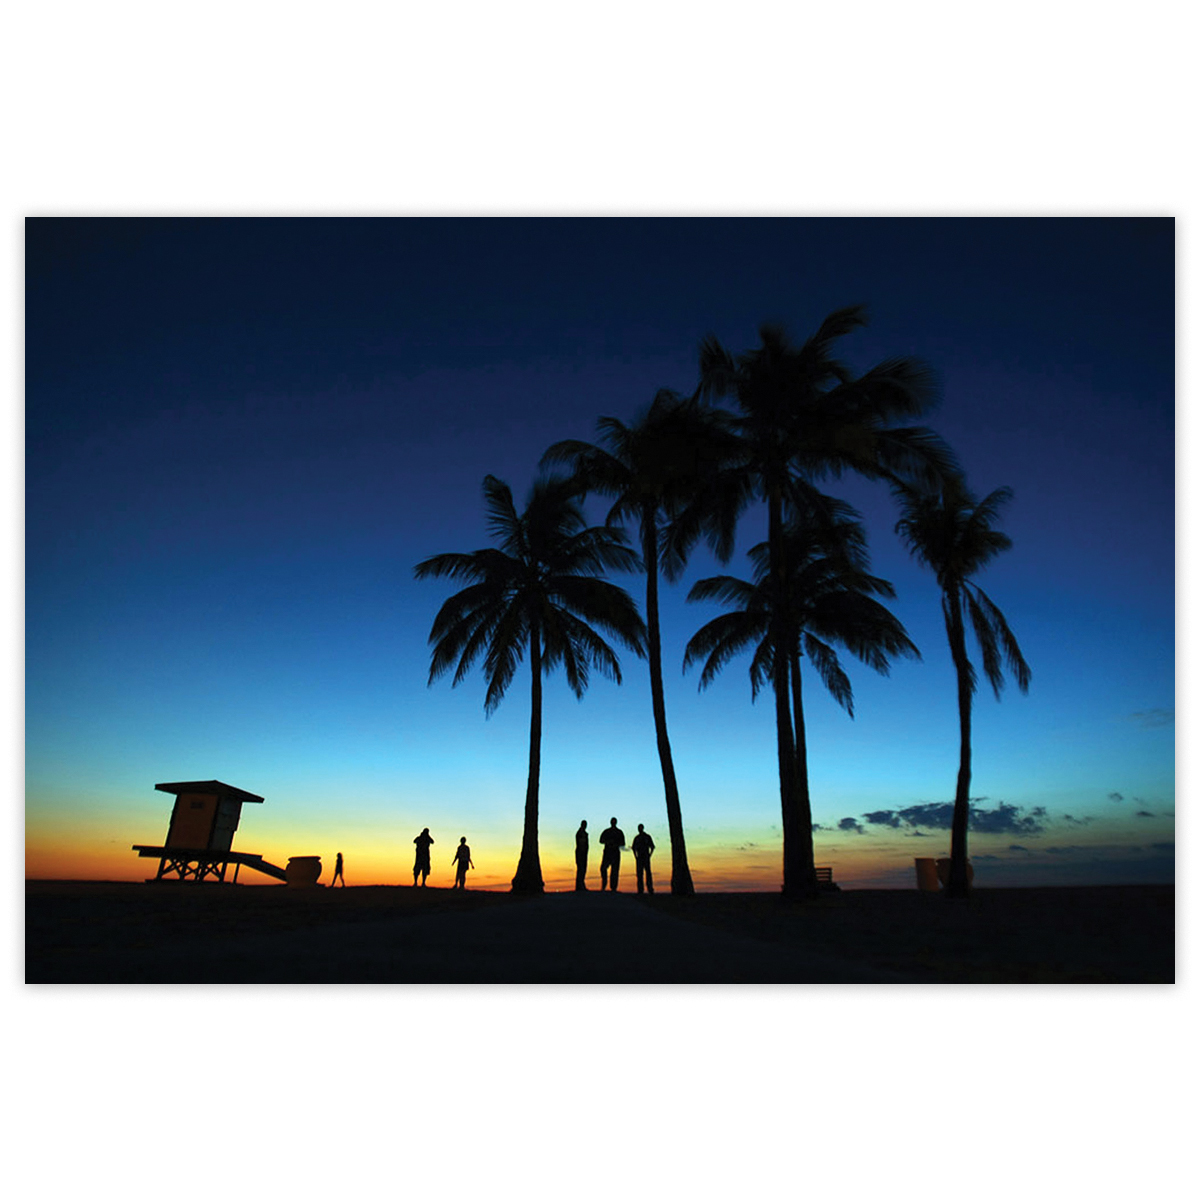 Sunrise & Sunset: Beach Palm Trees